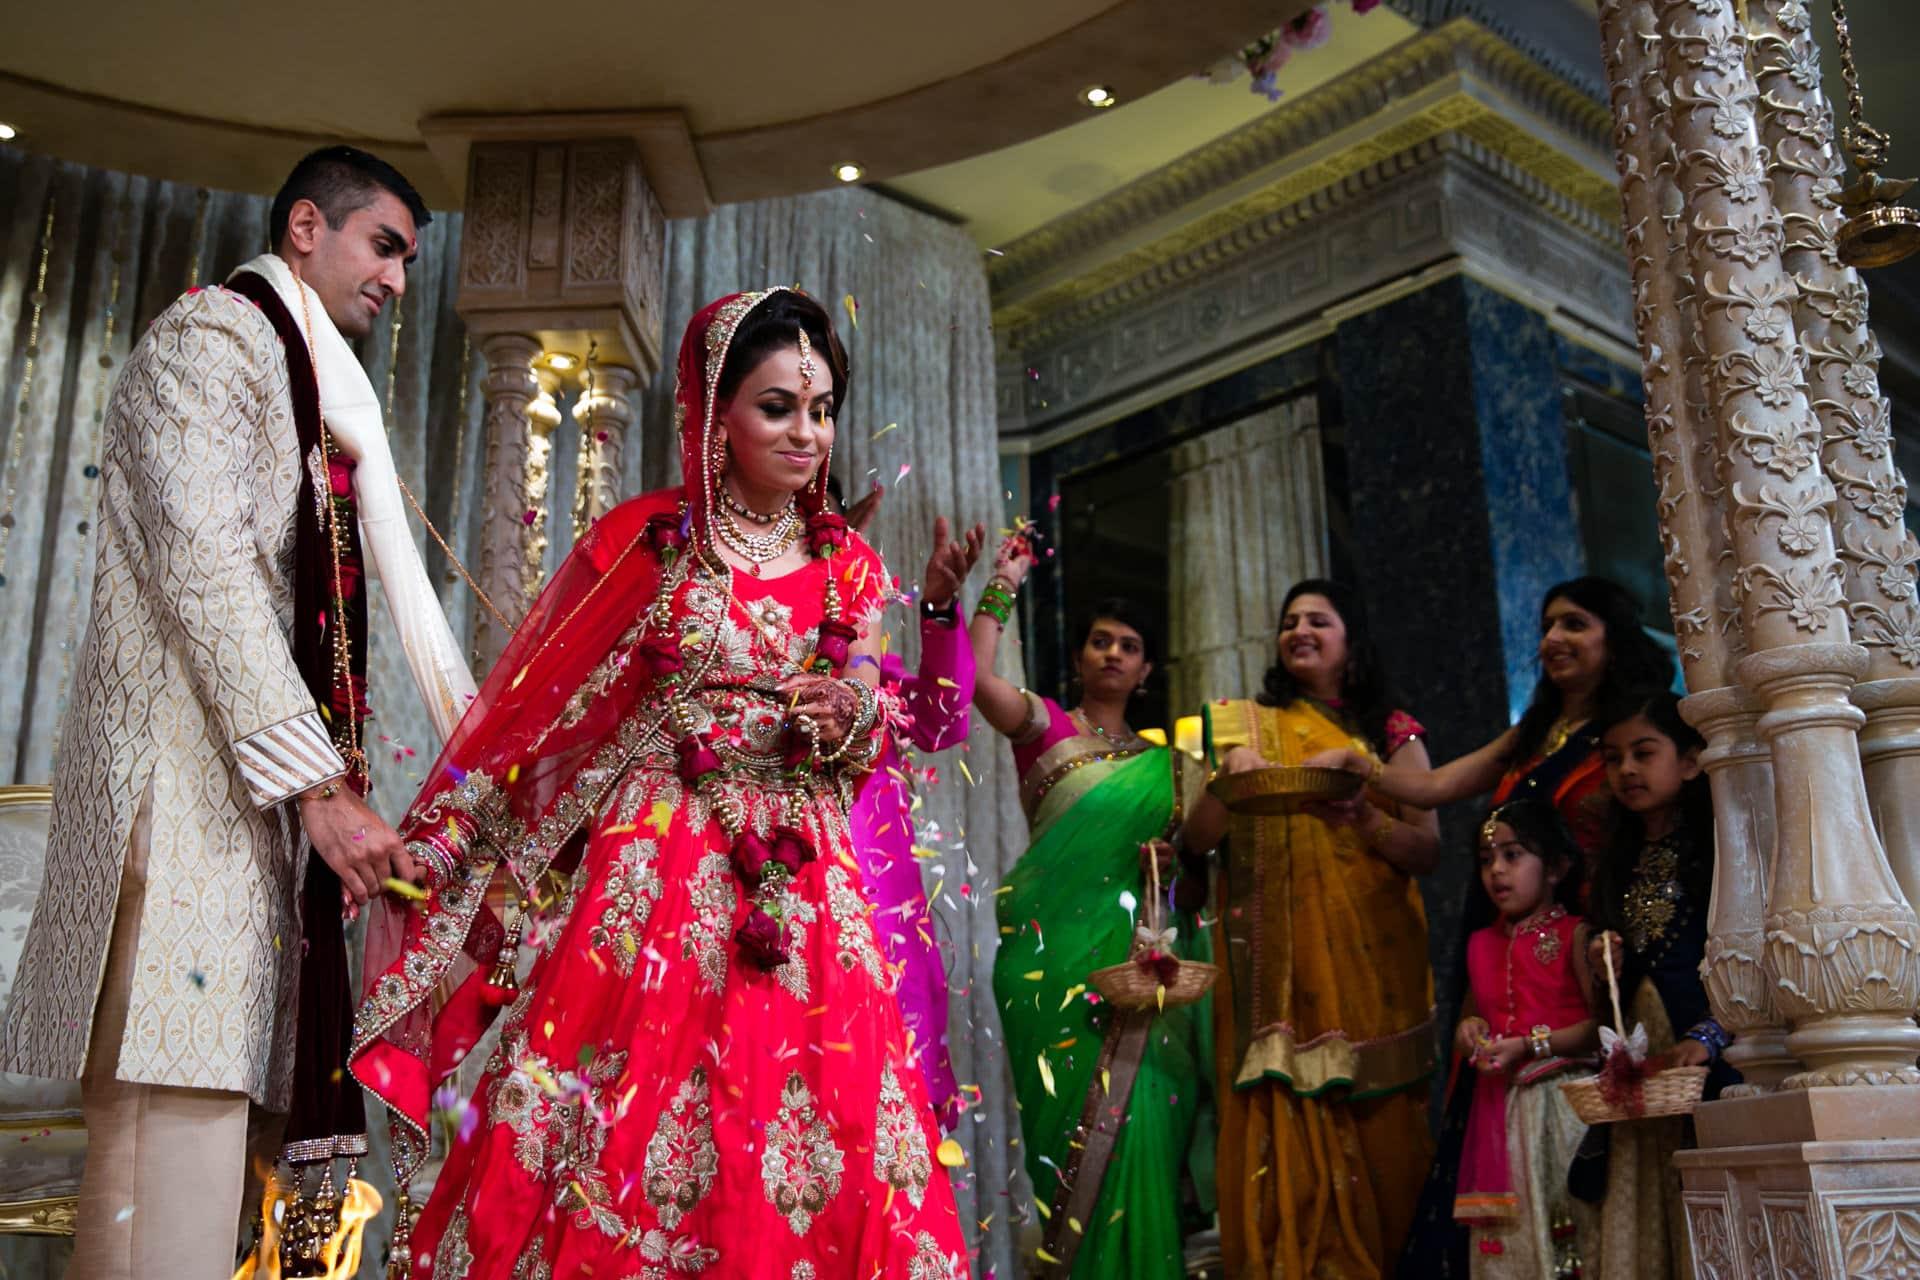 Bride leading the Phera ceremony at Hindu wedding